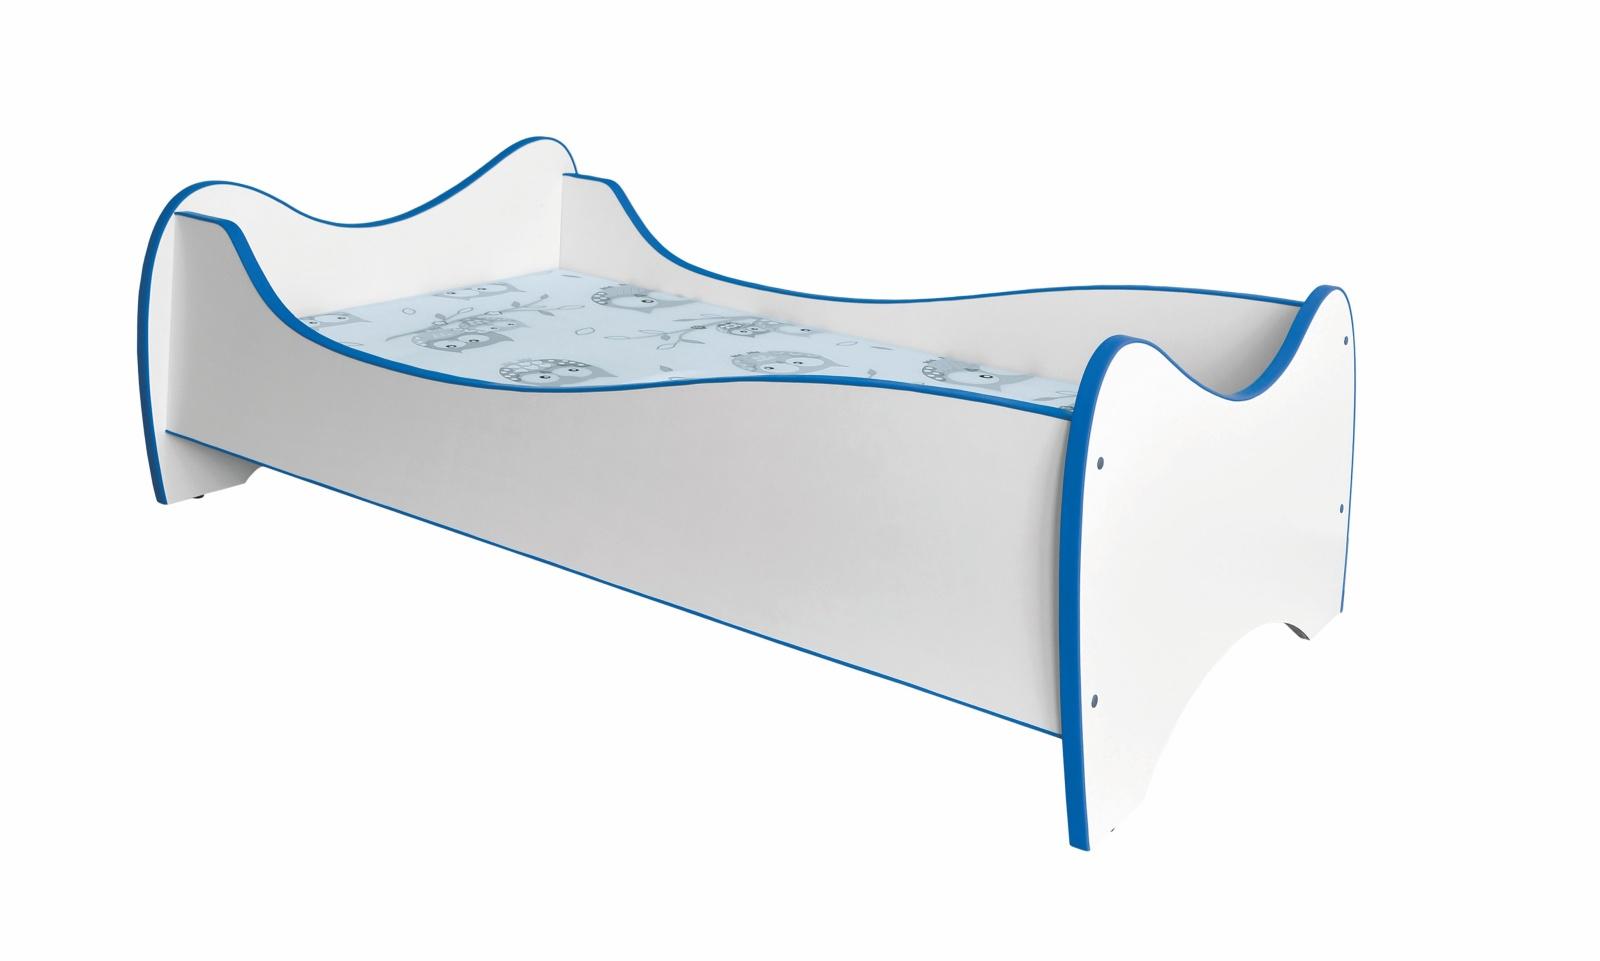 Dětská postel DUO, bílá/modrá